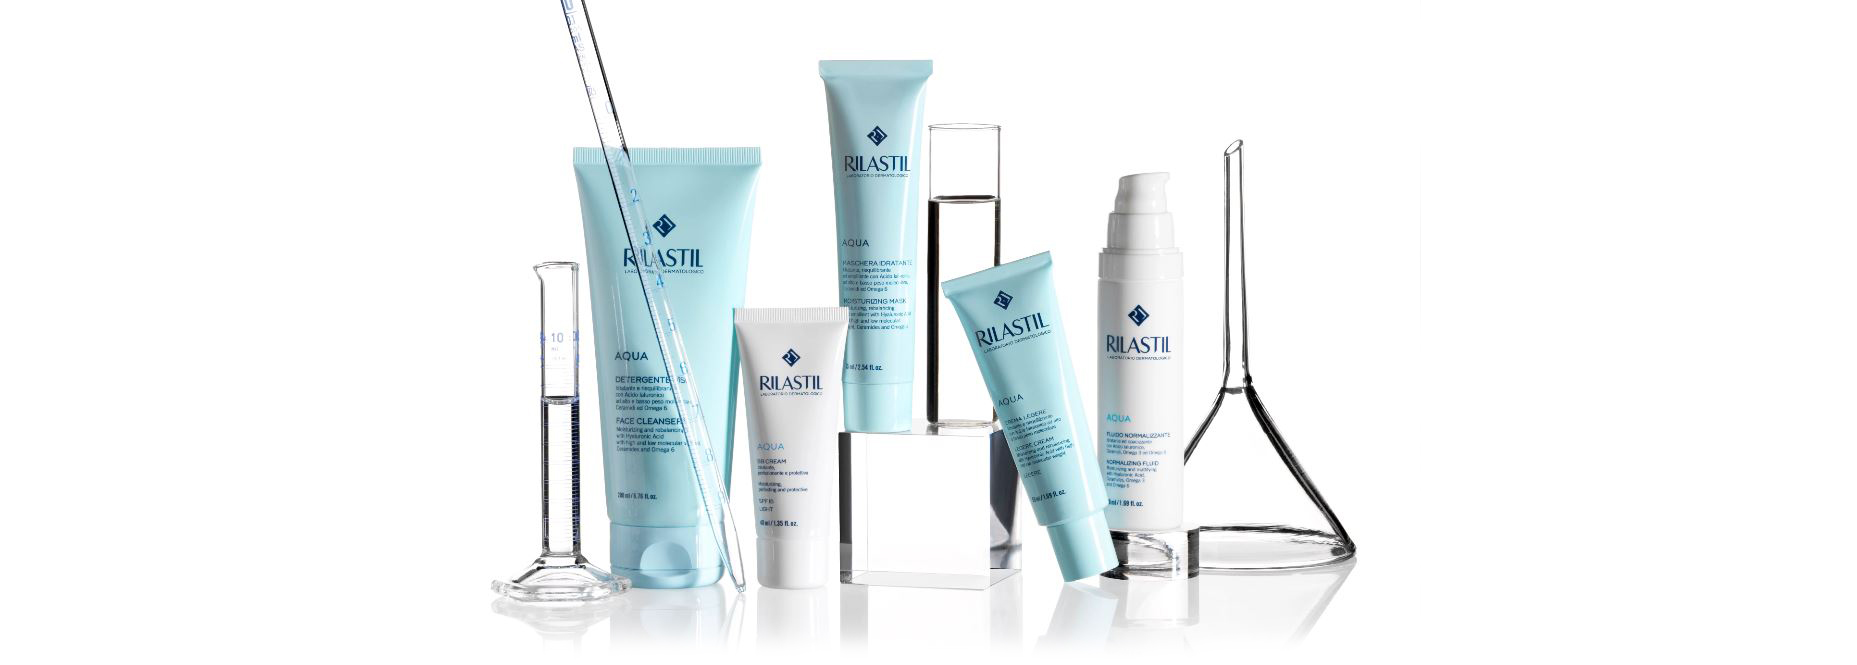 RILASTIL Aqua Productos